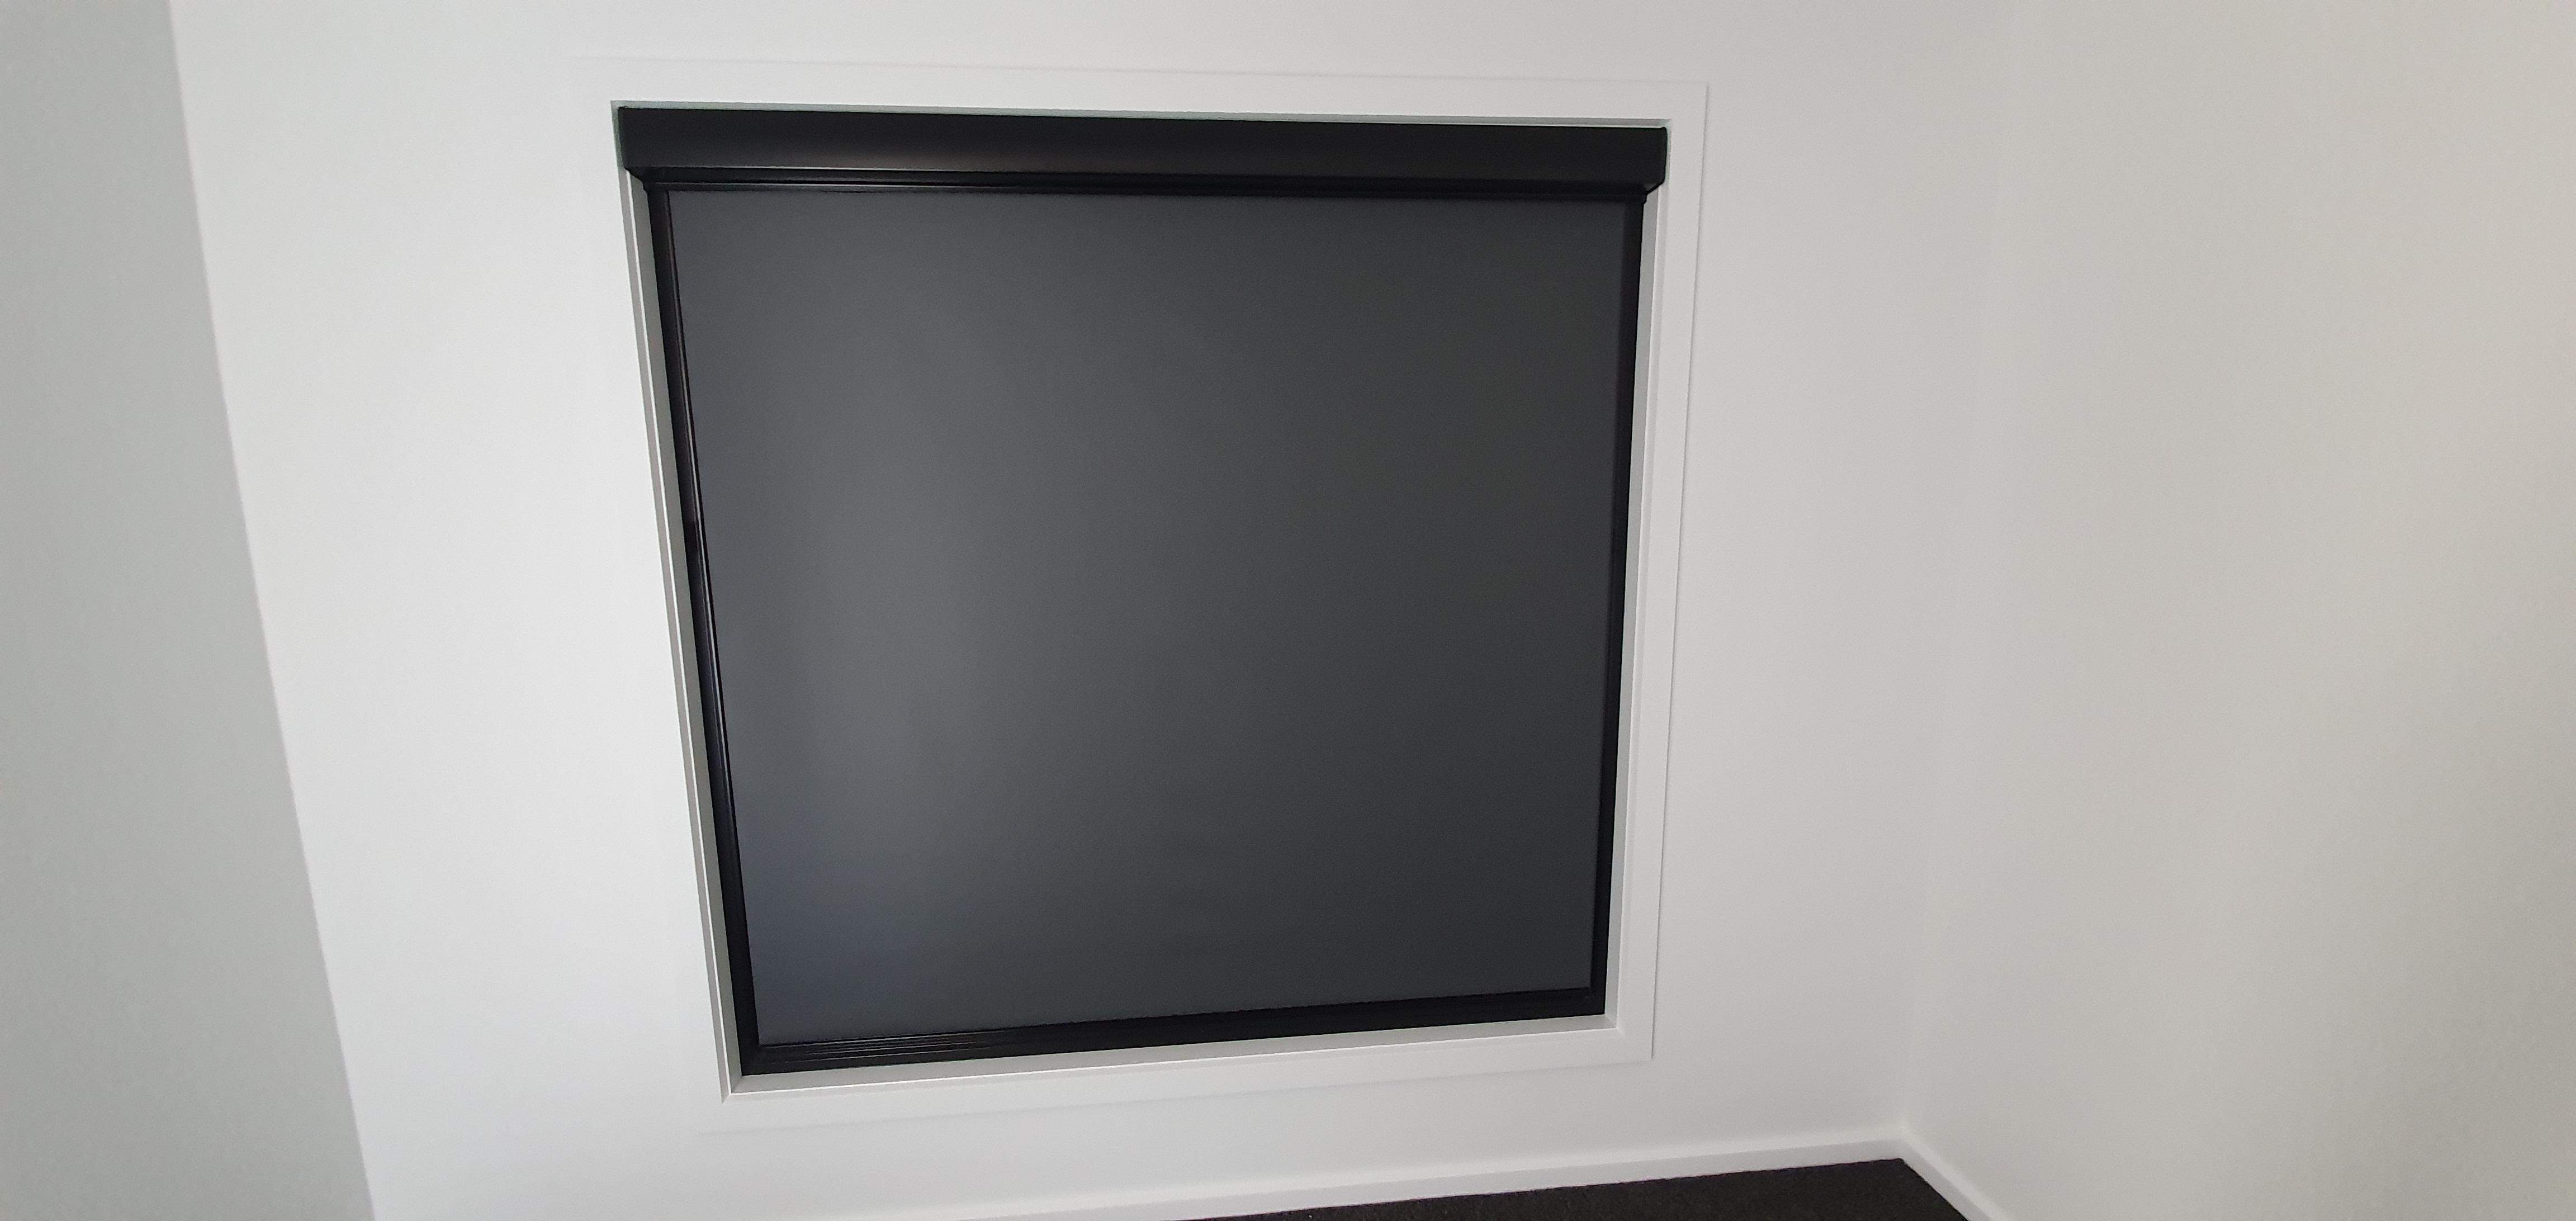 Ziptrak® Interior Roller blind full bock